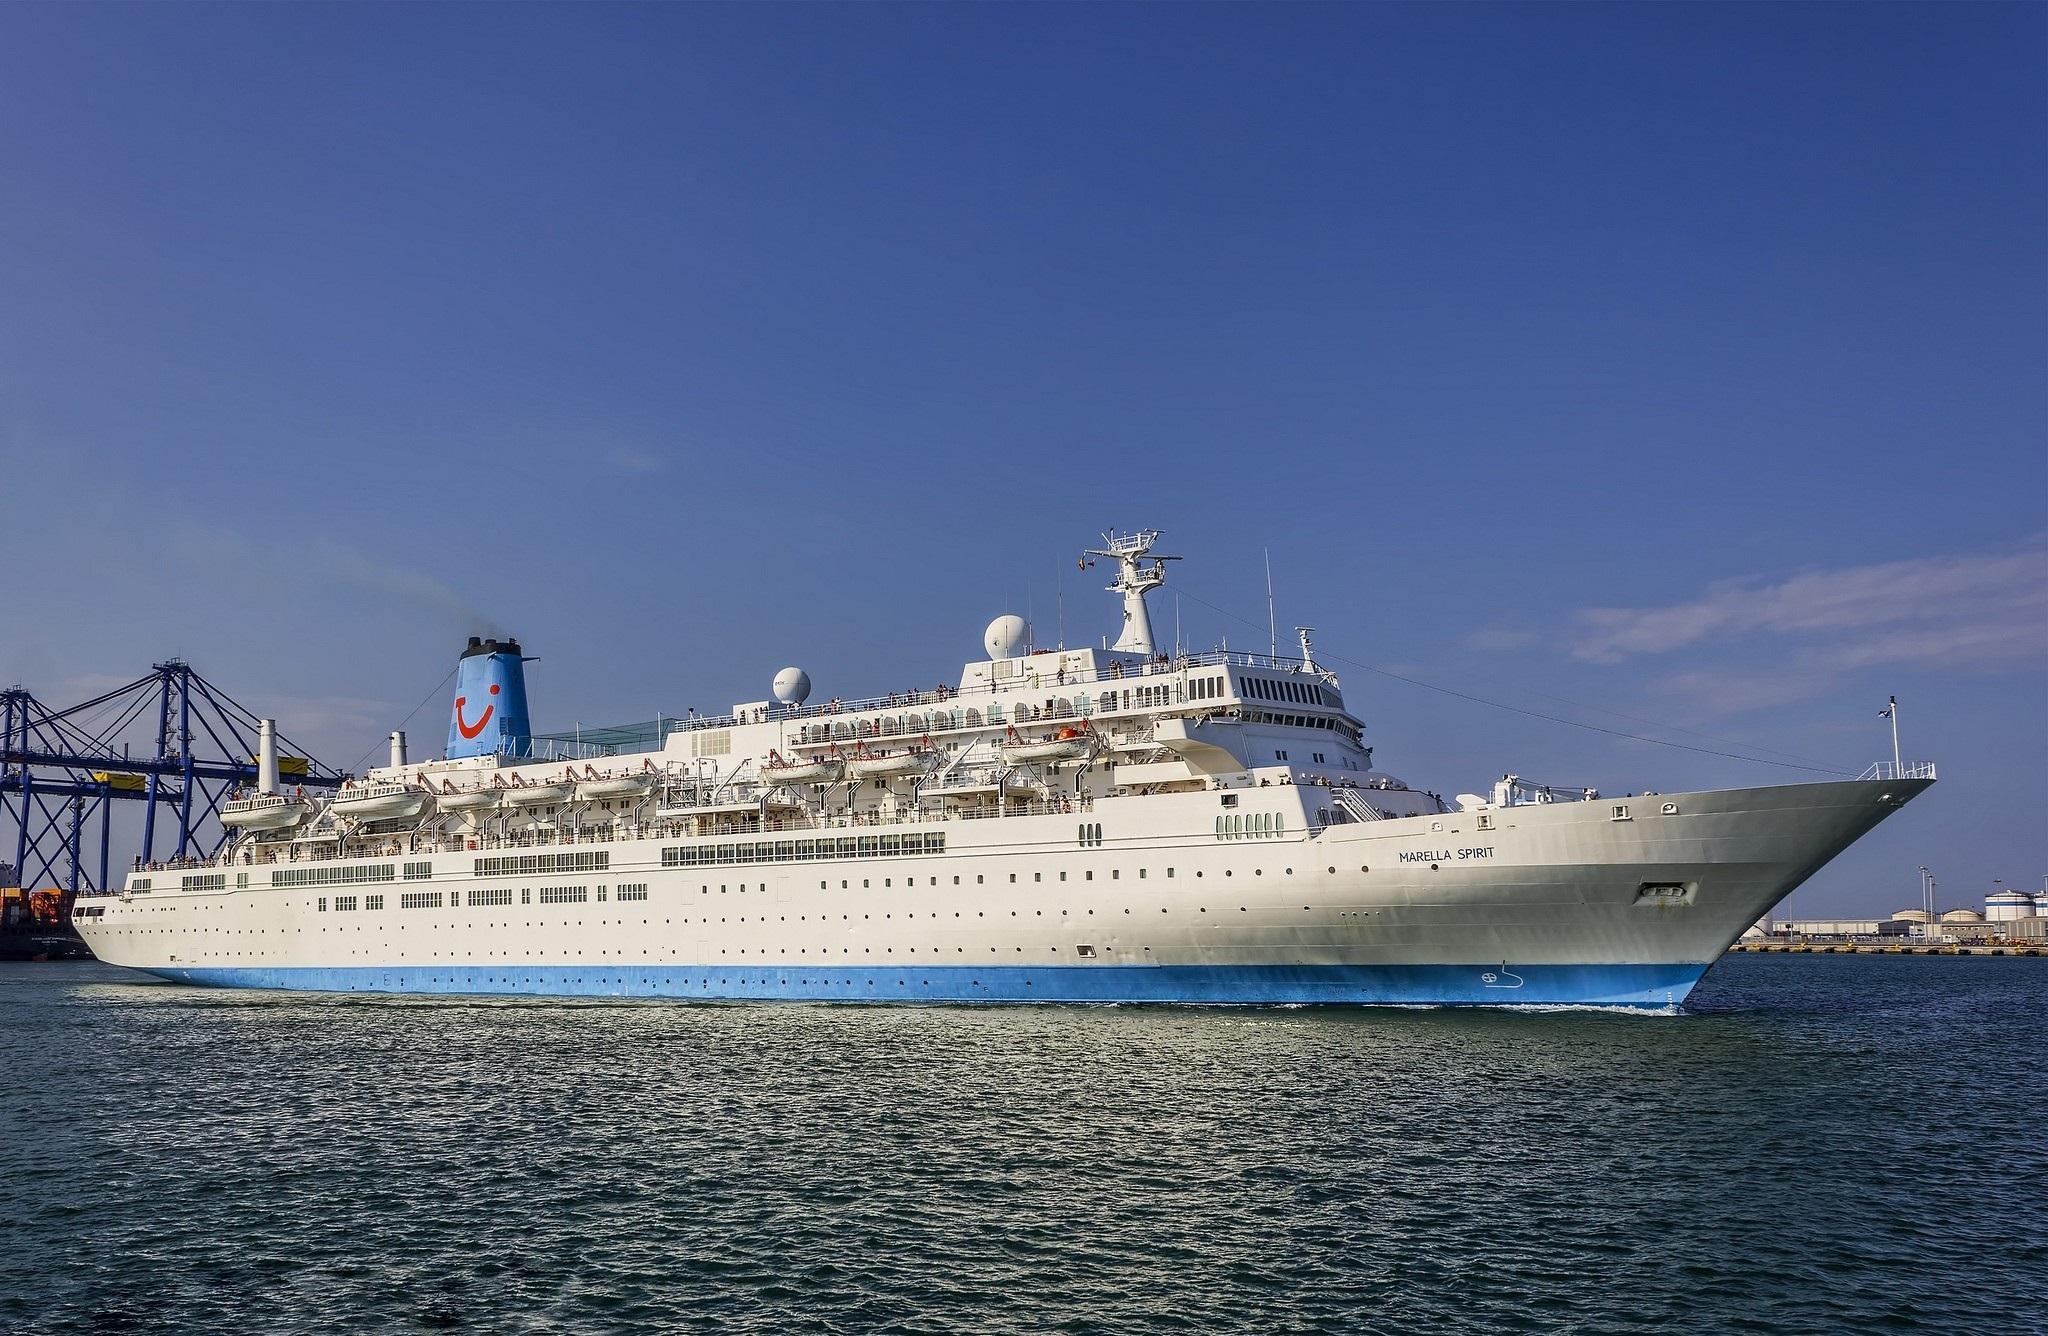 Cruise Ship Hd Wallpaper Background Image 2048x1336 Id1009248